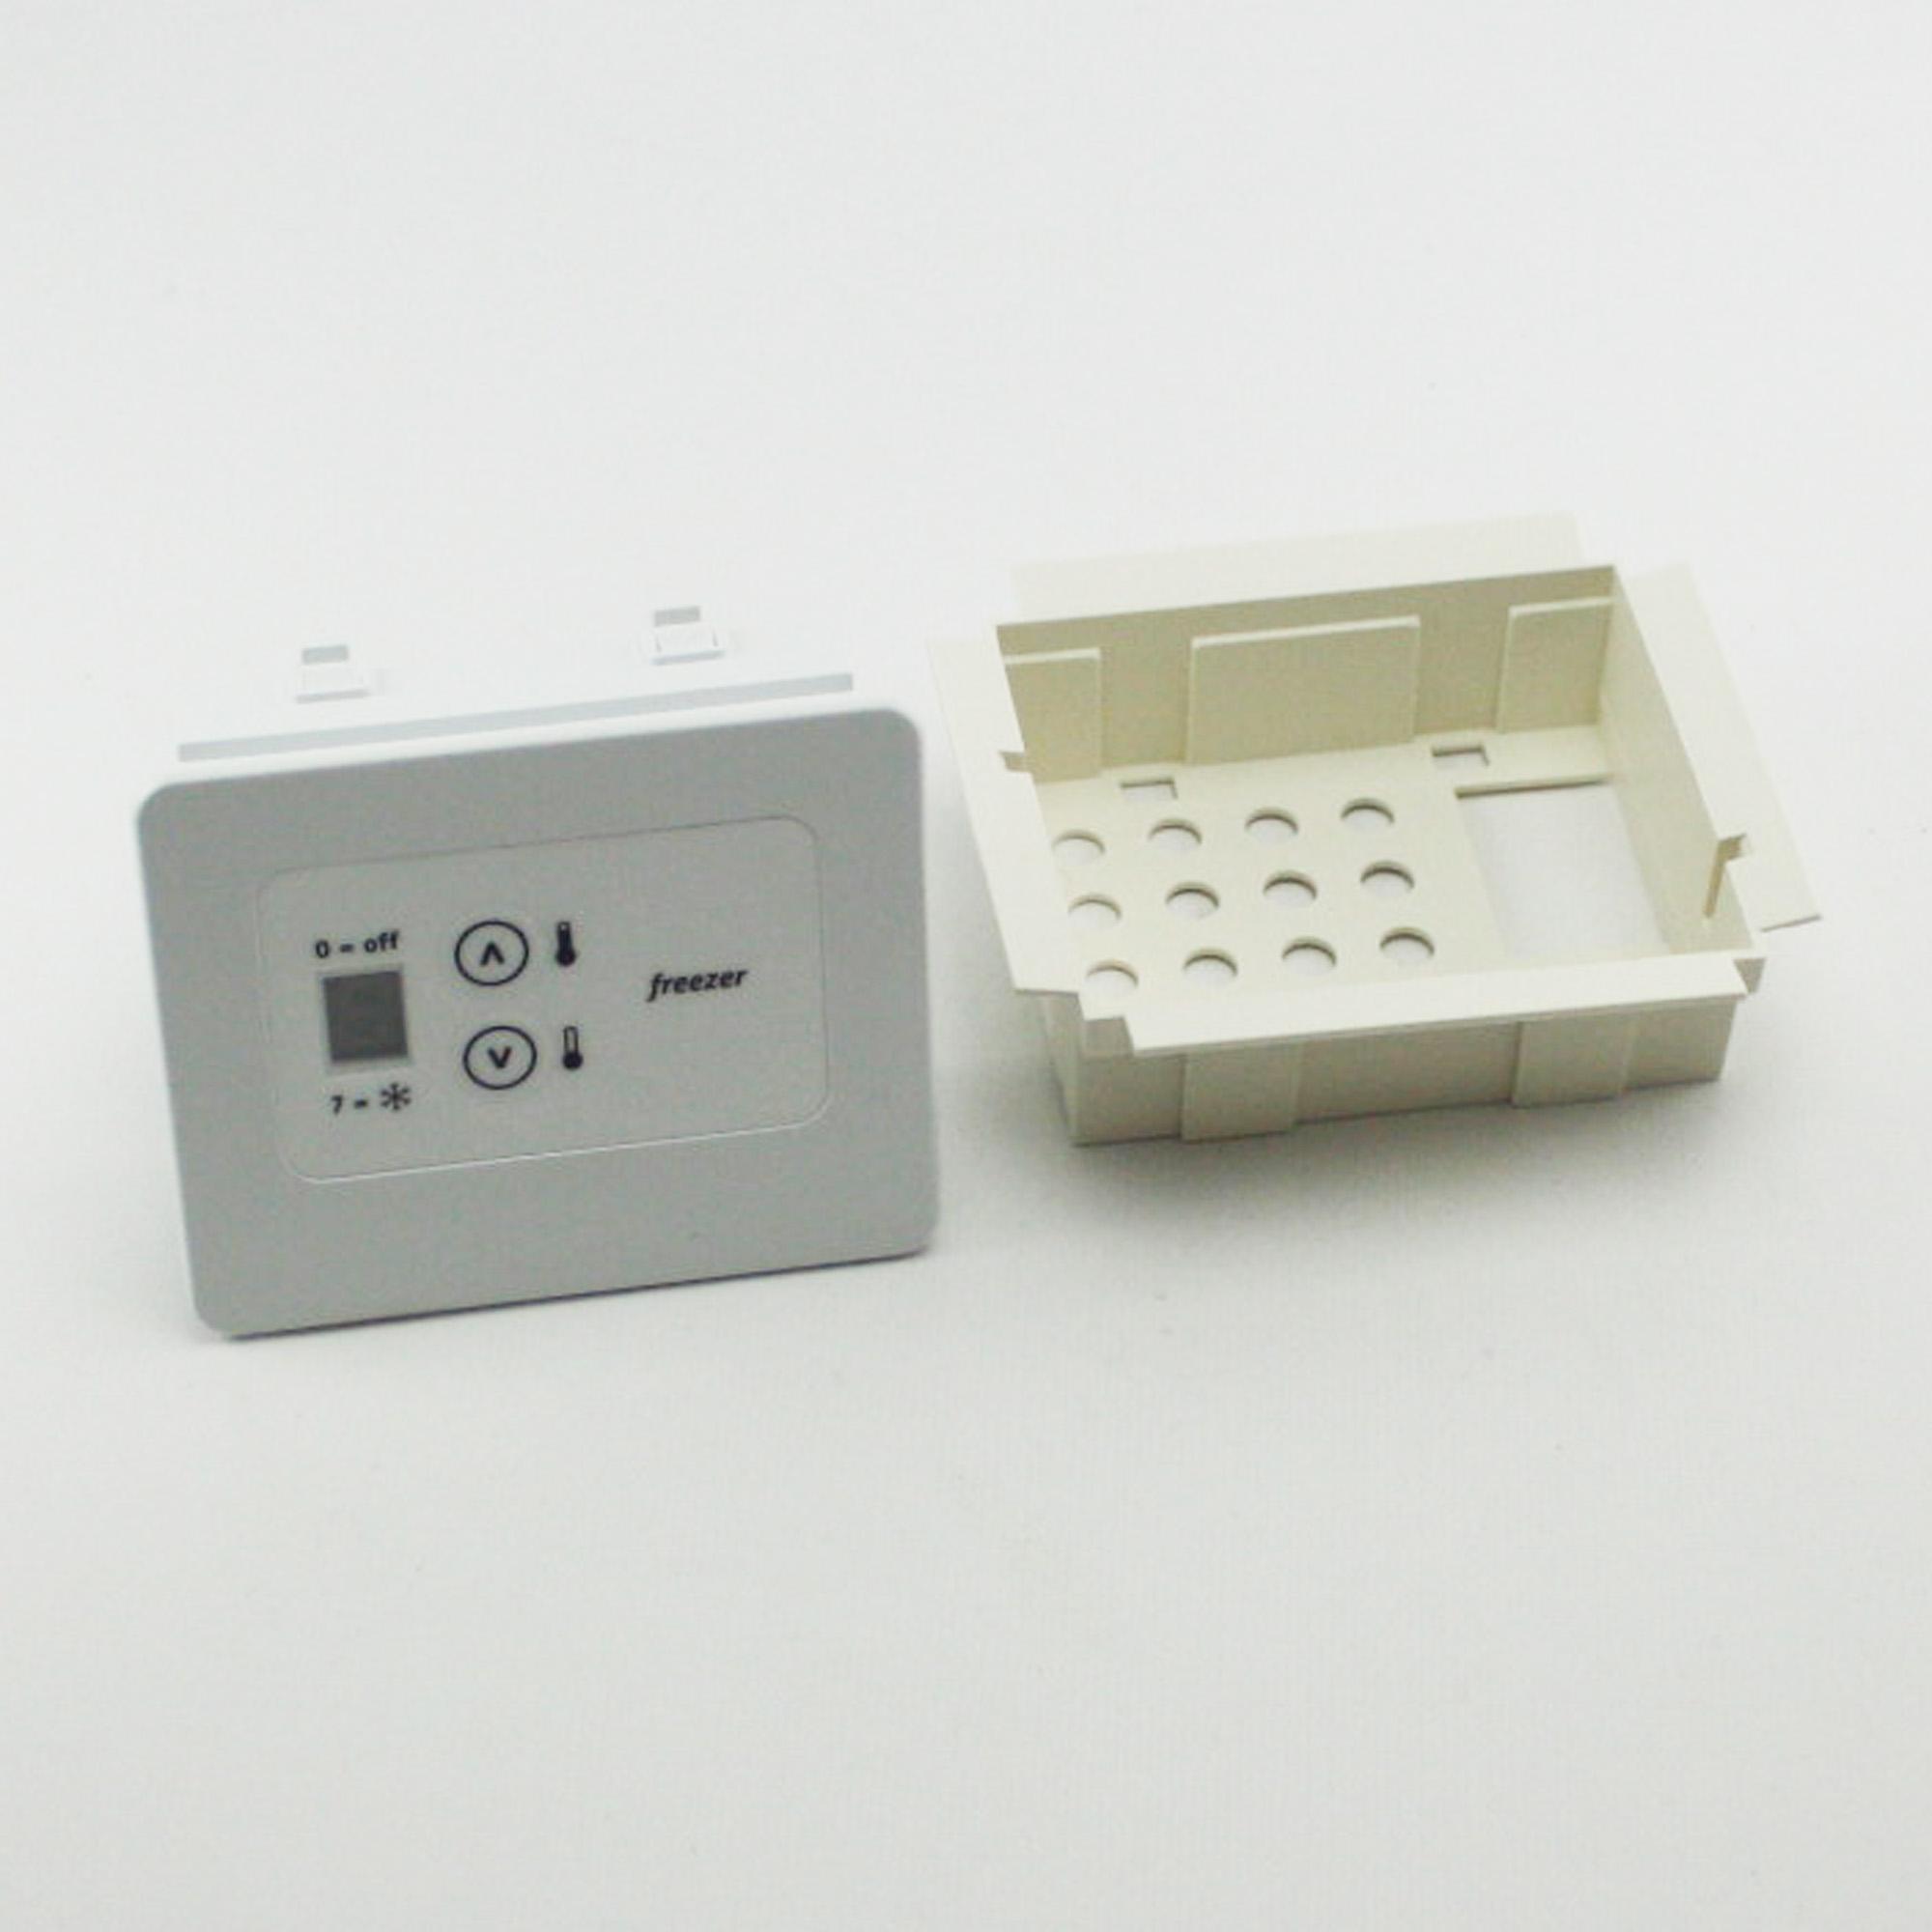 297282800 frigidaire freezer control board. Black Bedroom Furniture Sets. Home Design Ideas